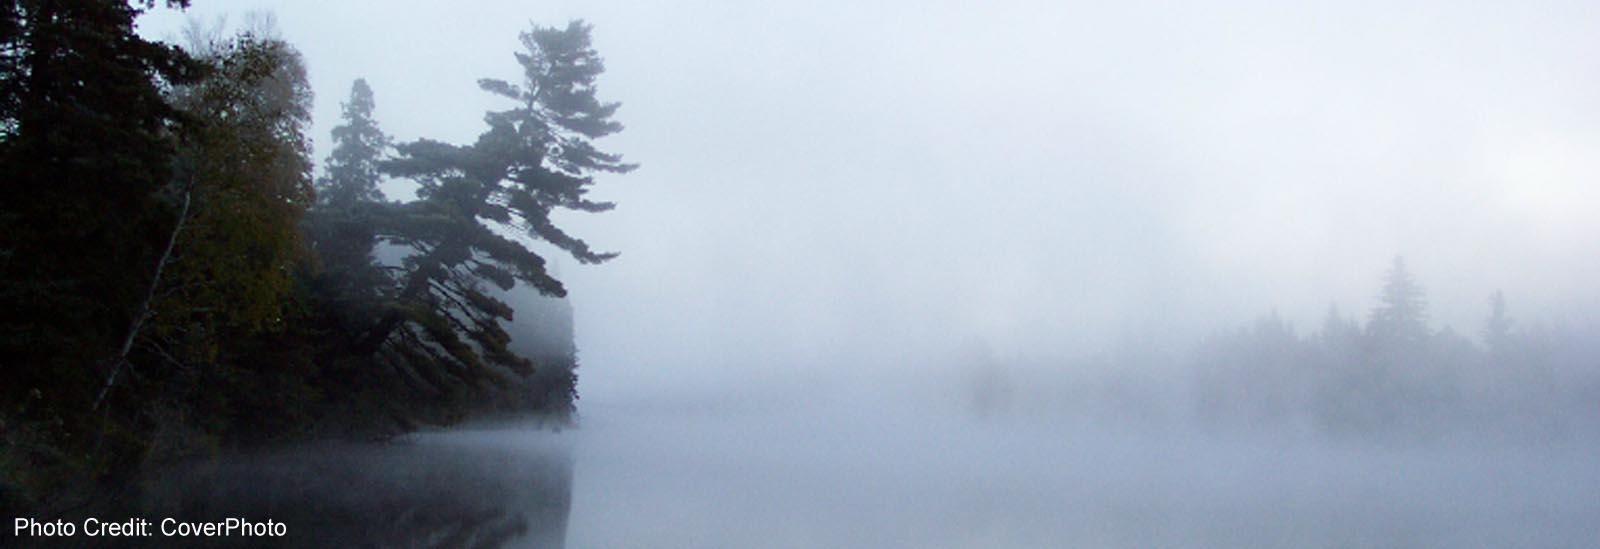 Spanish River - Naim Centre river view in fog-sliver (CoverPhoto)